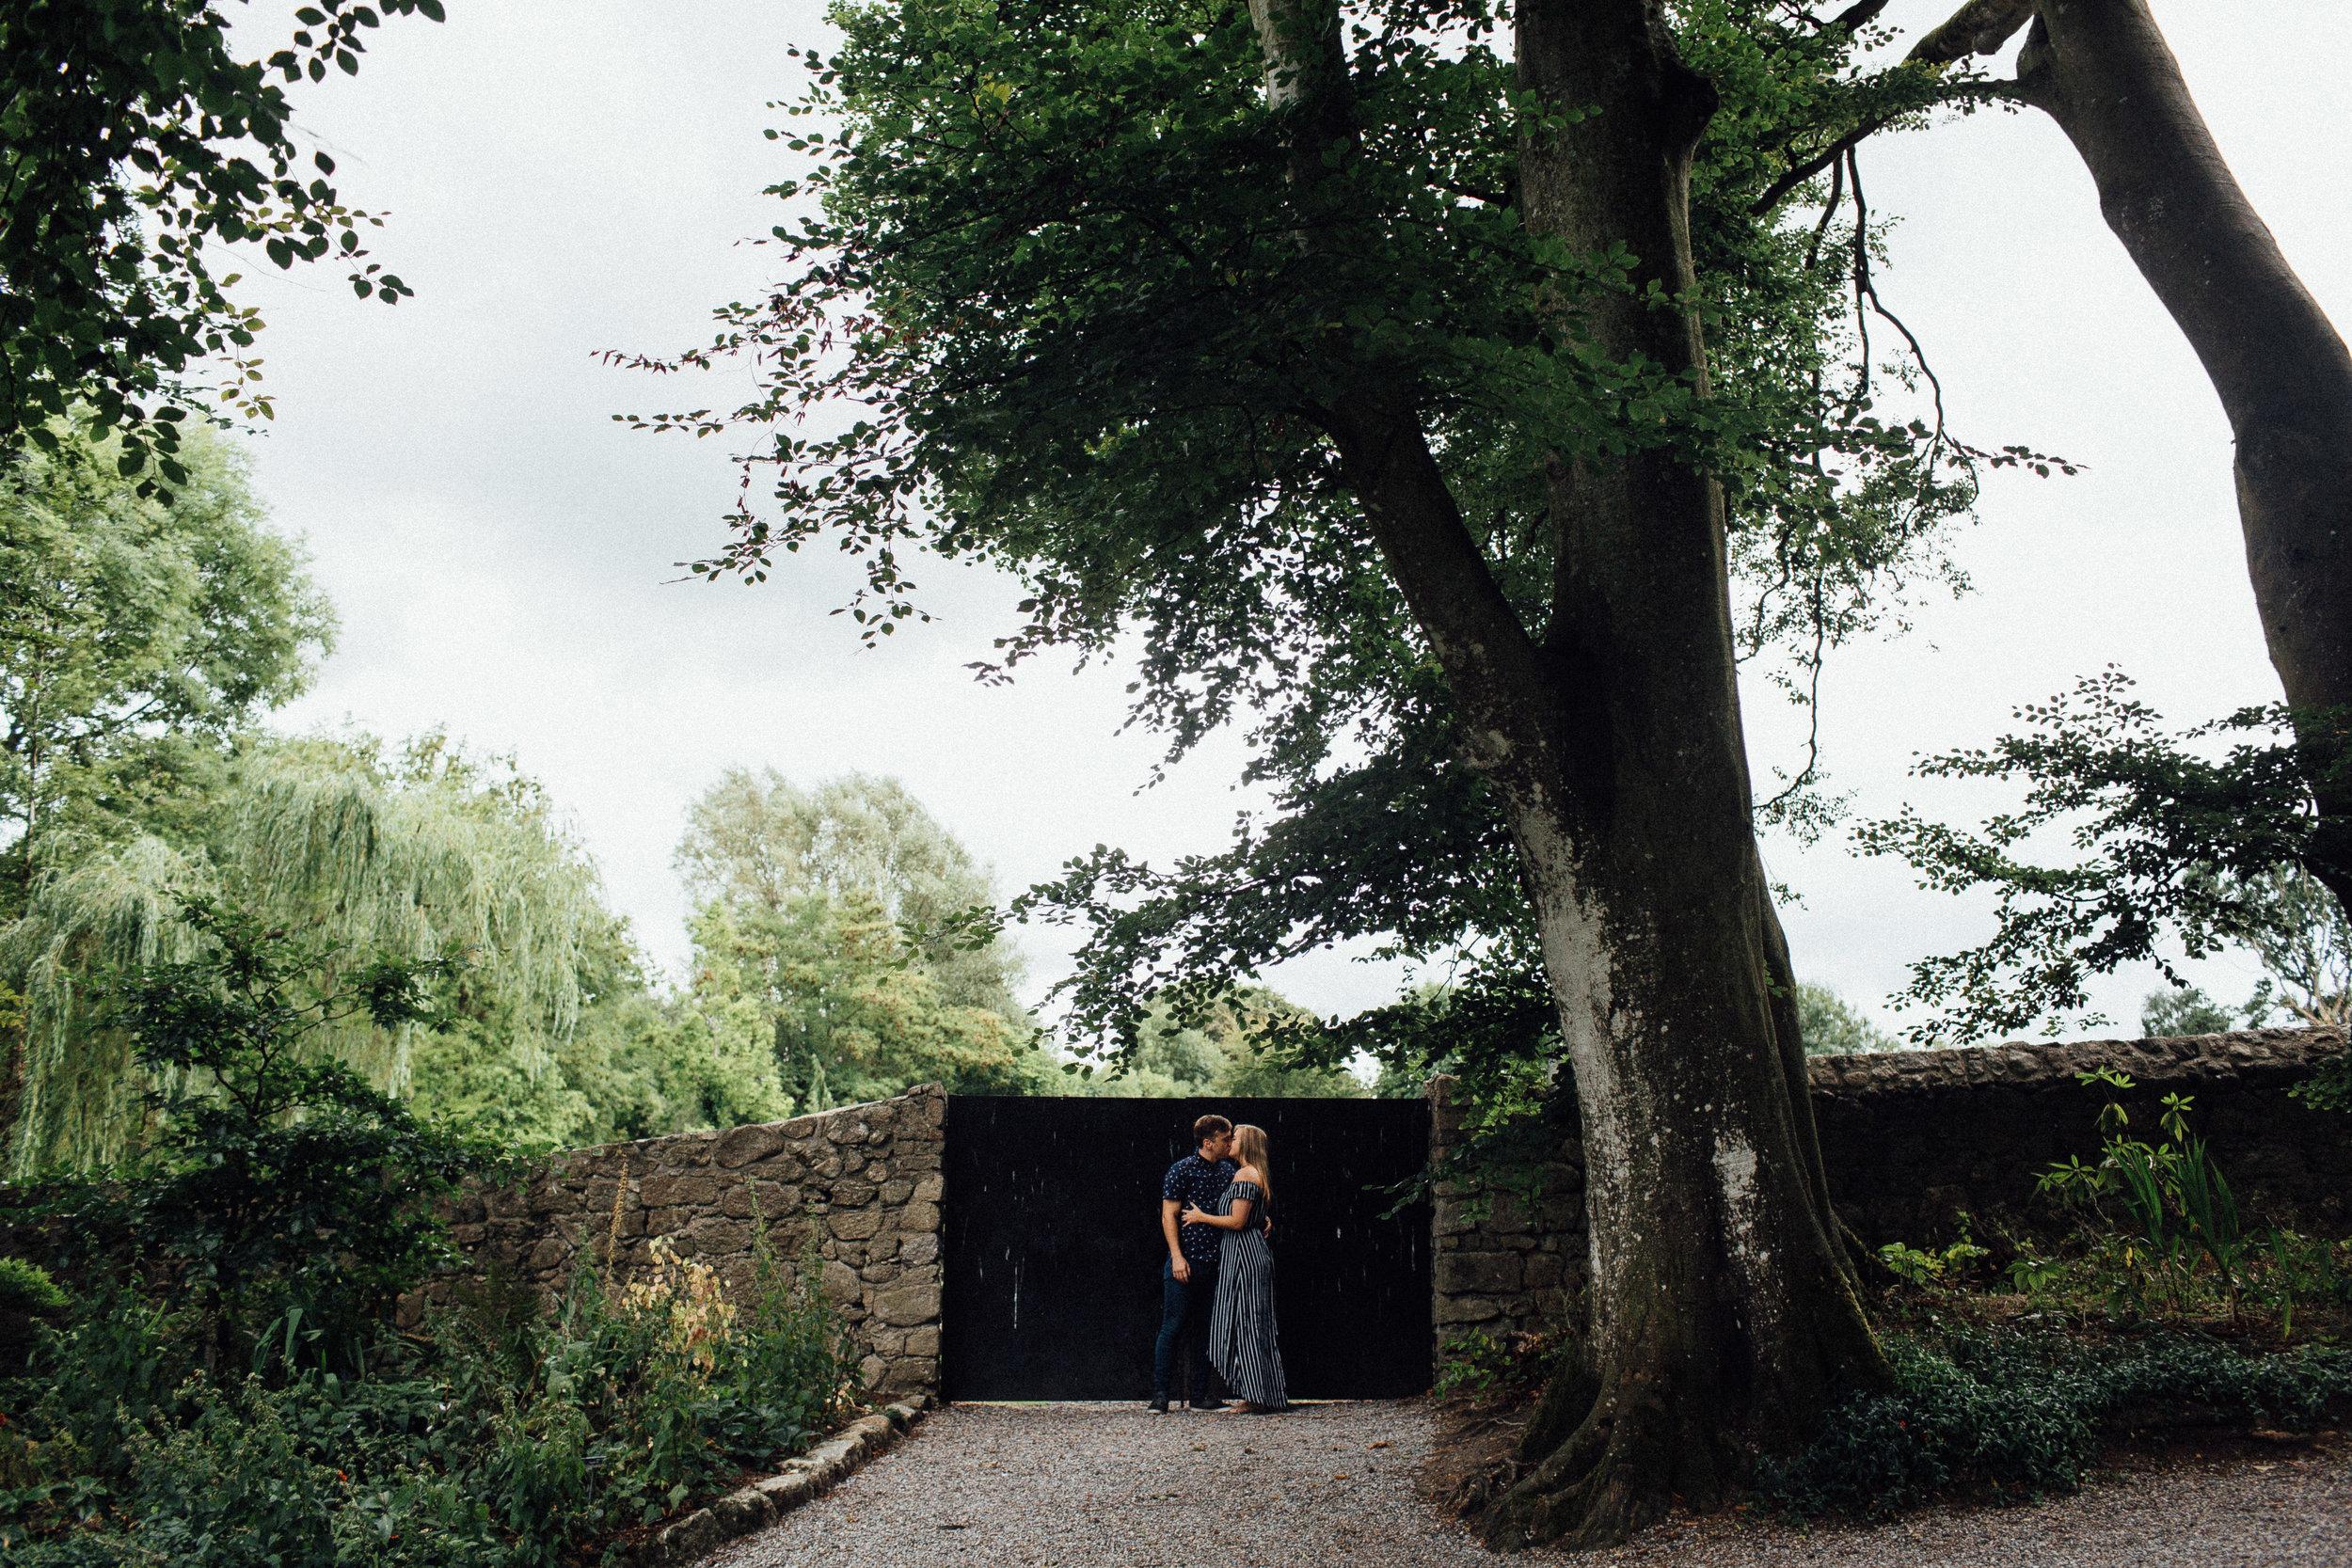 ireland_county_wicklow_glendalough_engagement_adventure_photography_windy_moody_atlanta_wedding_photographer_1003.jpg